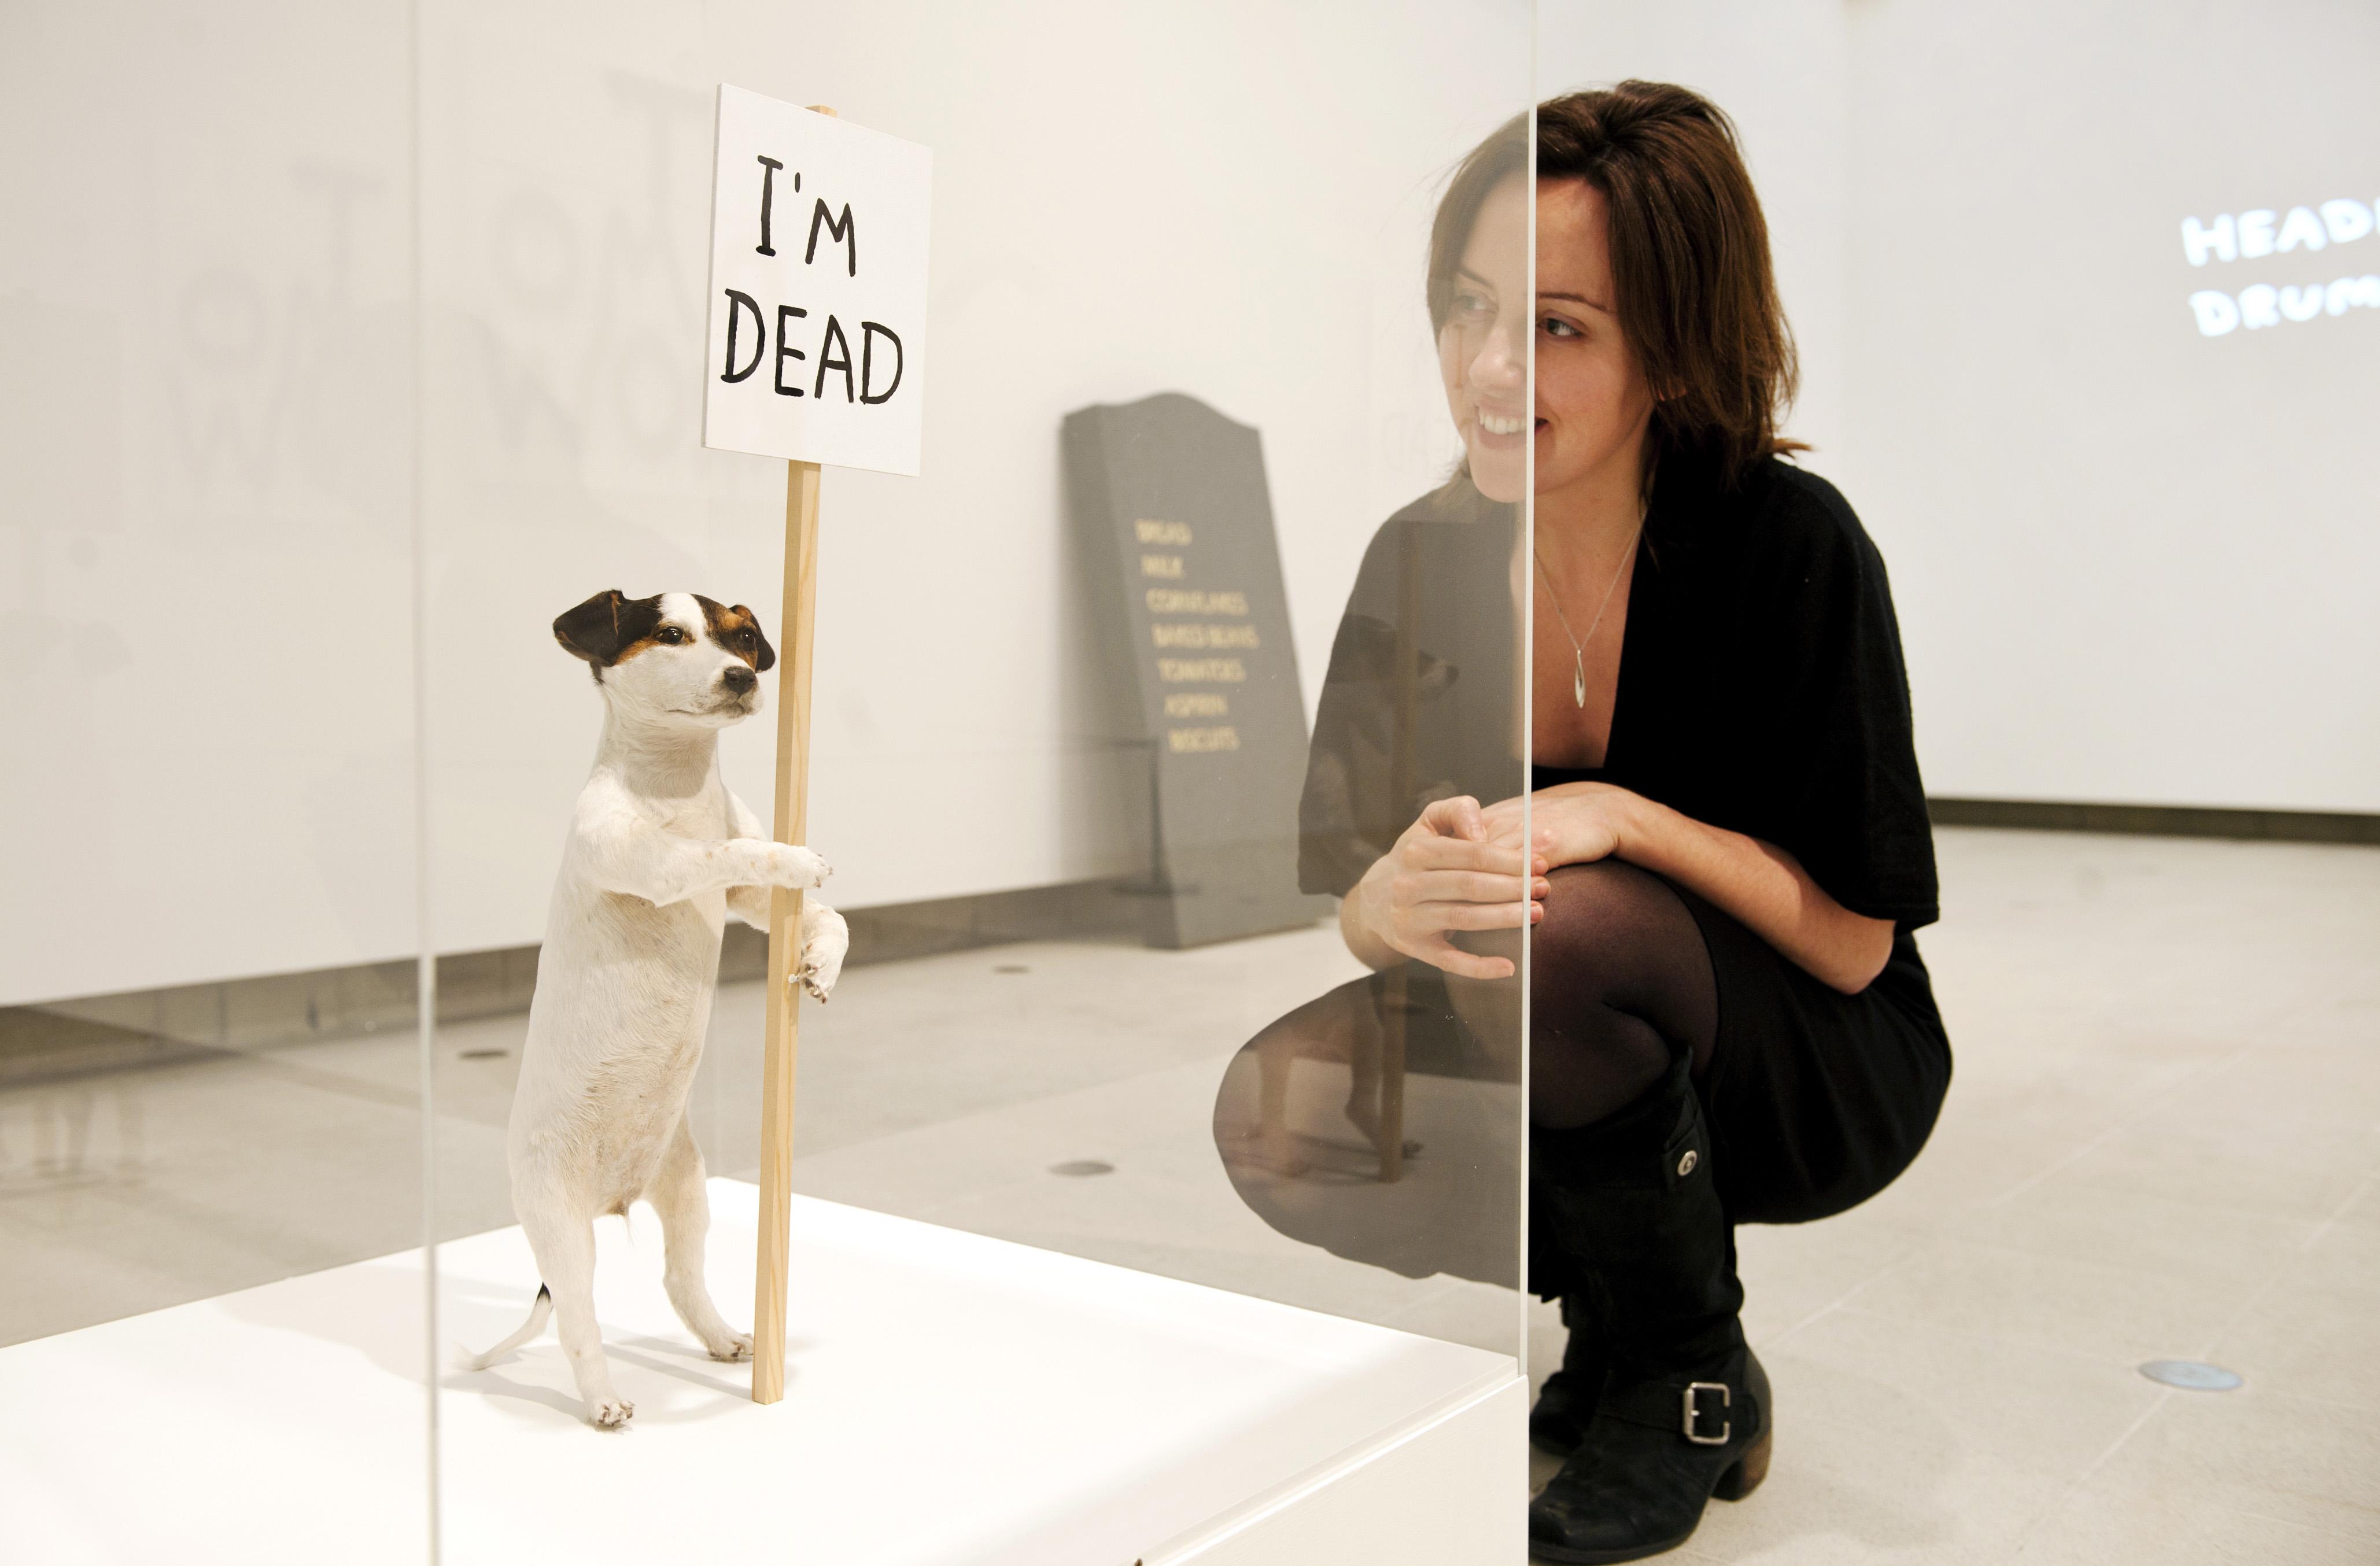 David Shrigley, I'm Dead 2010 at Brain Activity exhibition at Hayward Gallery, Southbank Centre, 2012. Photo by Linda Nylind.